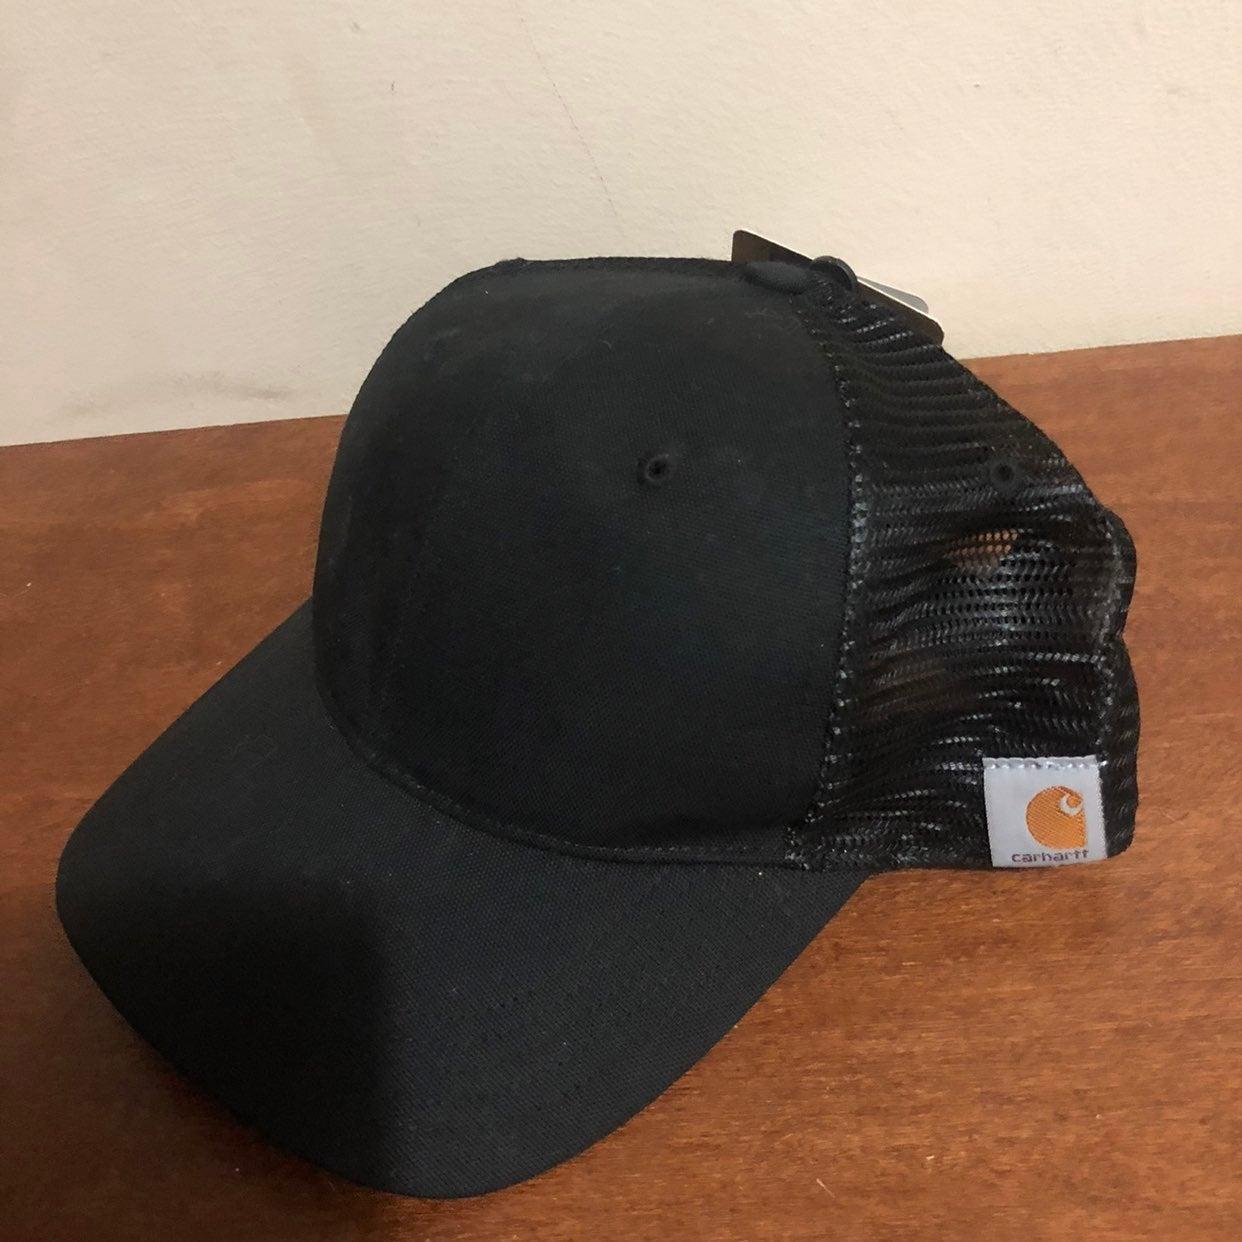 New adjustable black Carhartt hat